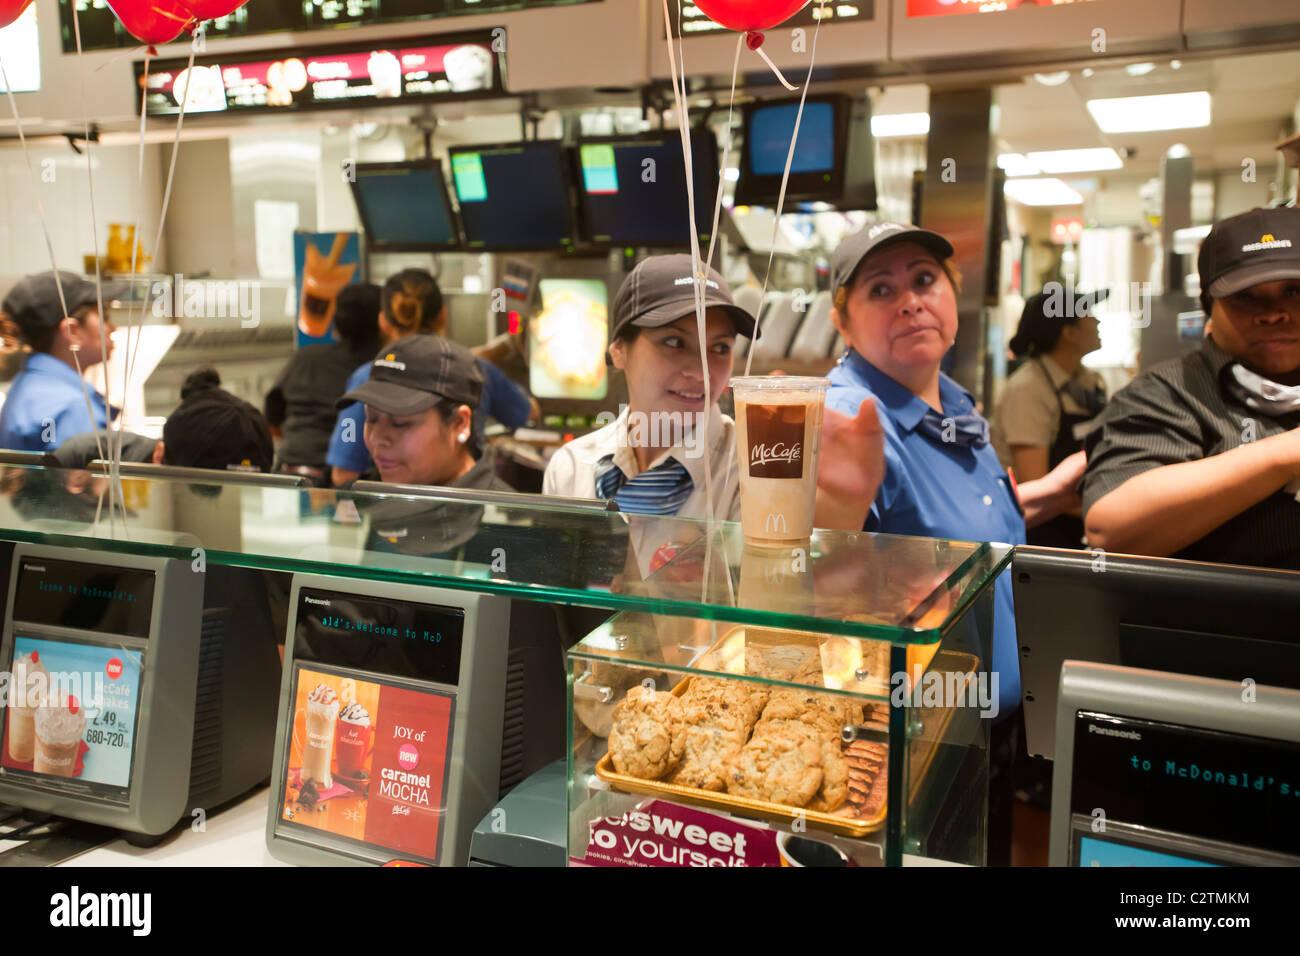 detroit mcdonalds customers say - HD1300×956